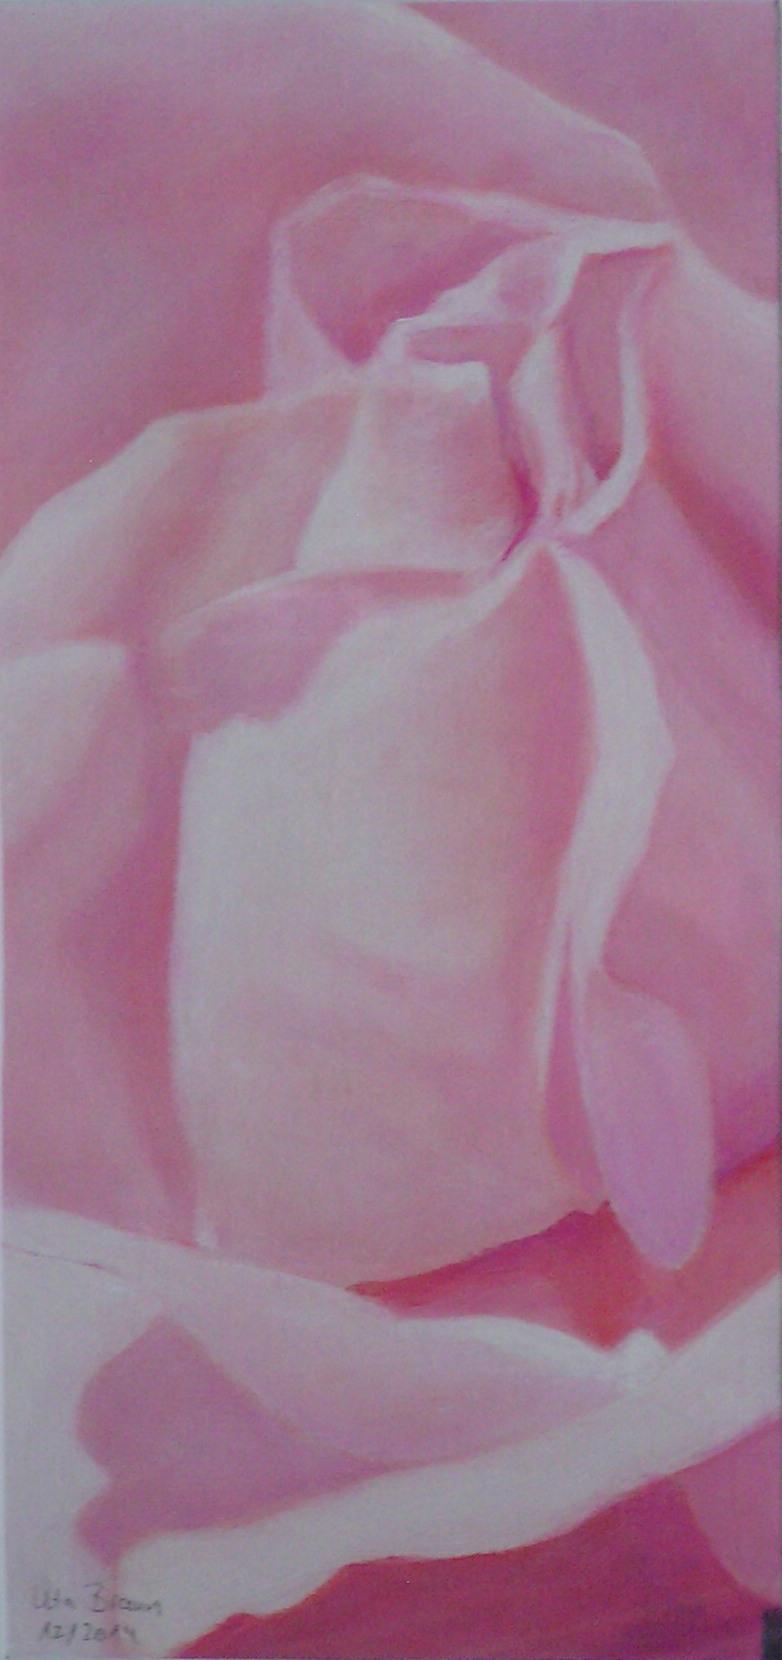 Blütenstruktur rosé- Julirose